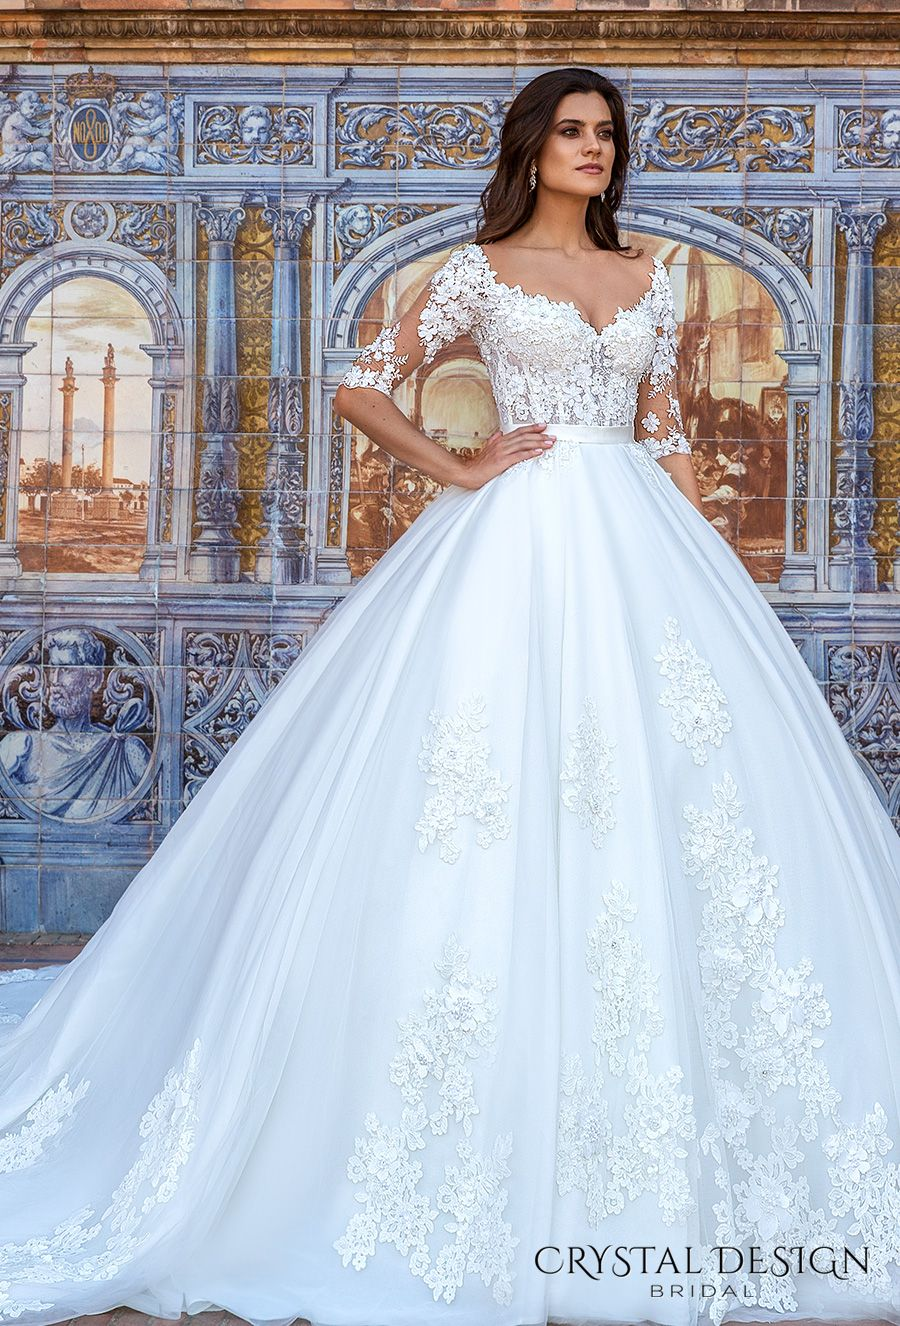 crystal design 2017 bridal half sleeves sweetheart neckline heavily embellished bodice princess wedding dress ball gown